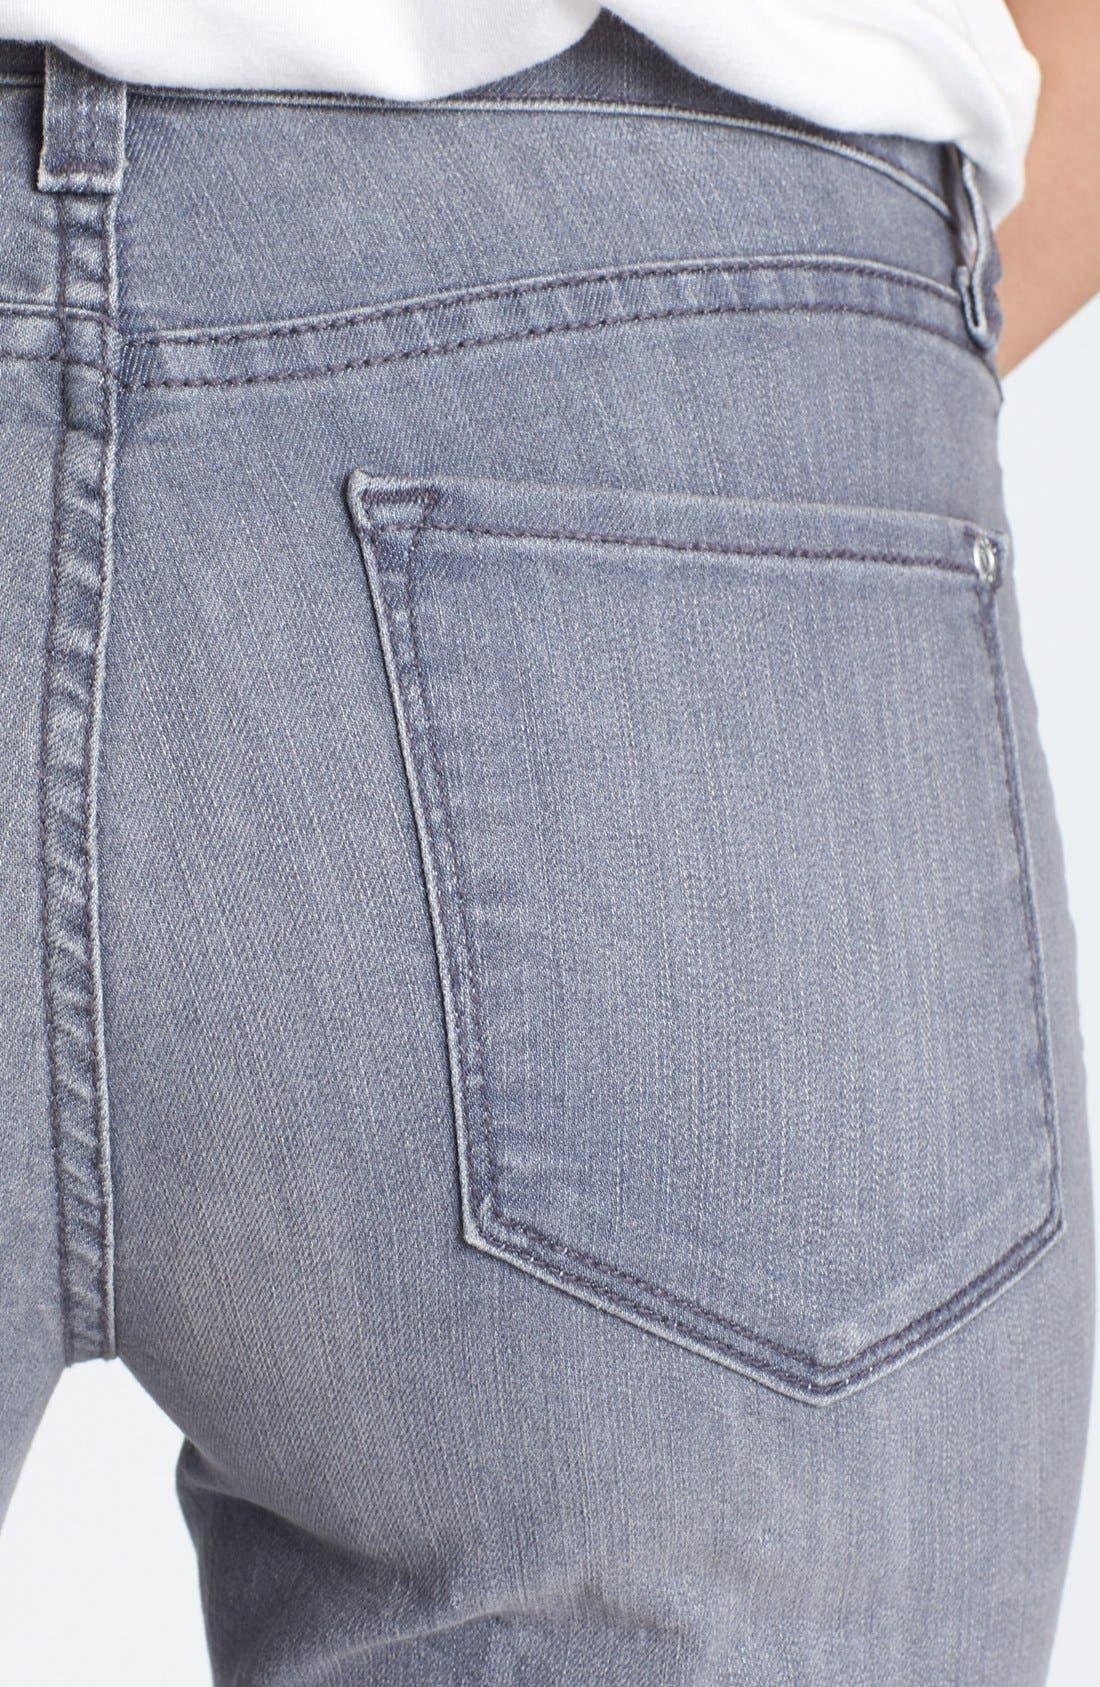 Alternate Image 3  - NYDJ 'Marilyn' Straight Leg Jeans (Grey) (Petite)